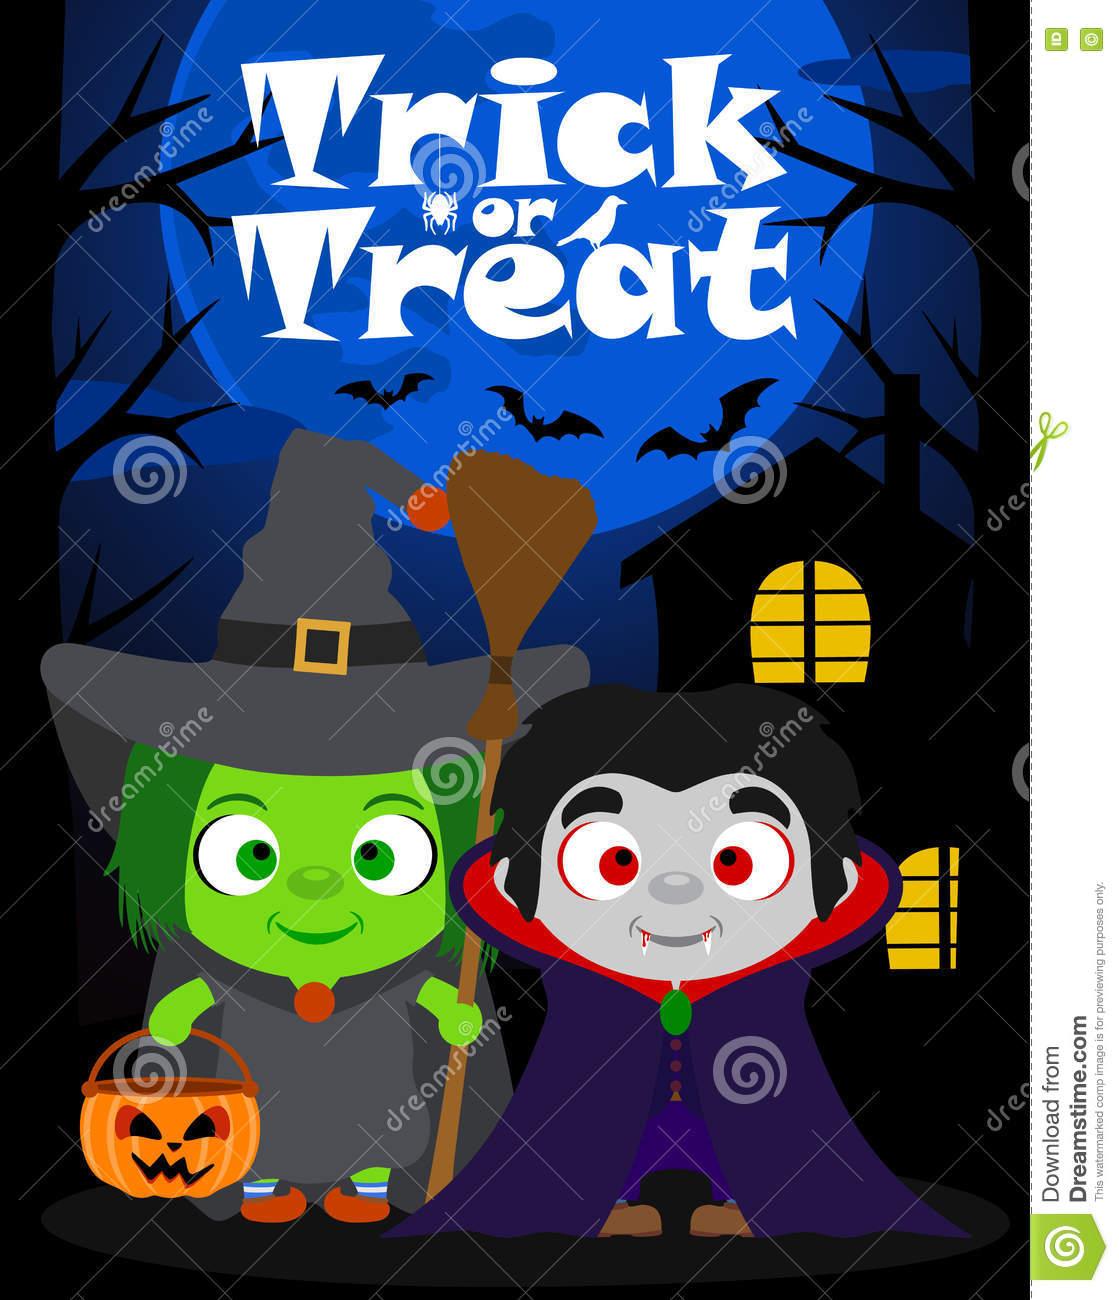 halloween-background-trick-treating-children-vector-costume